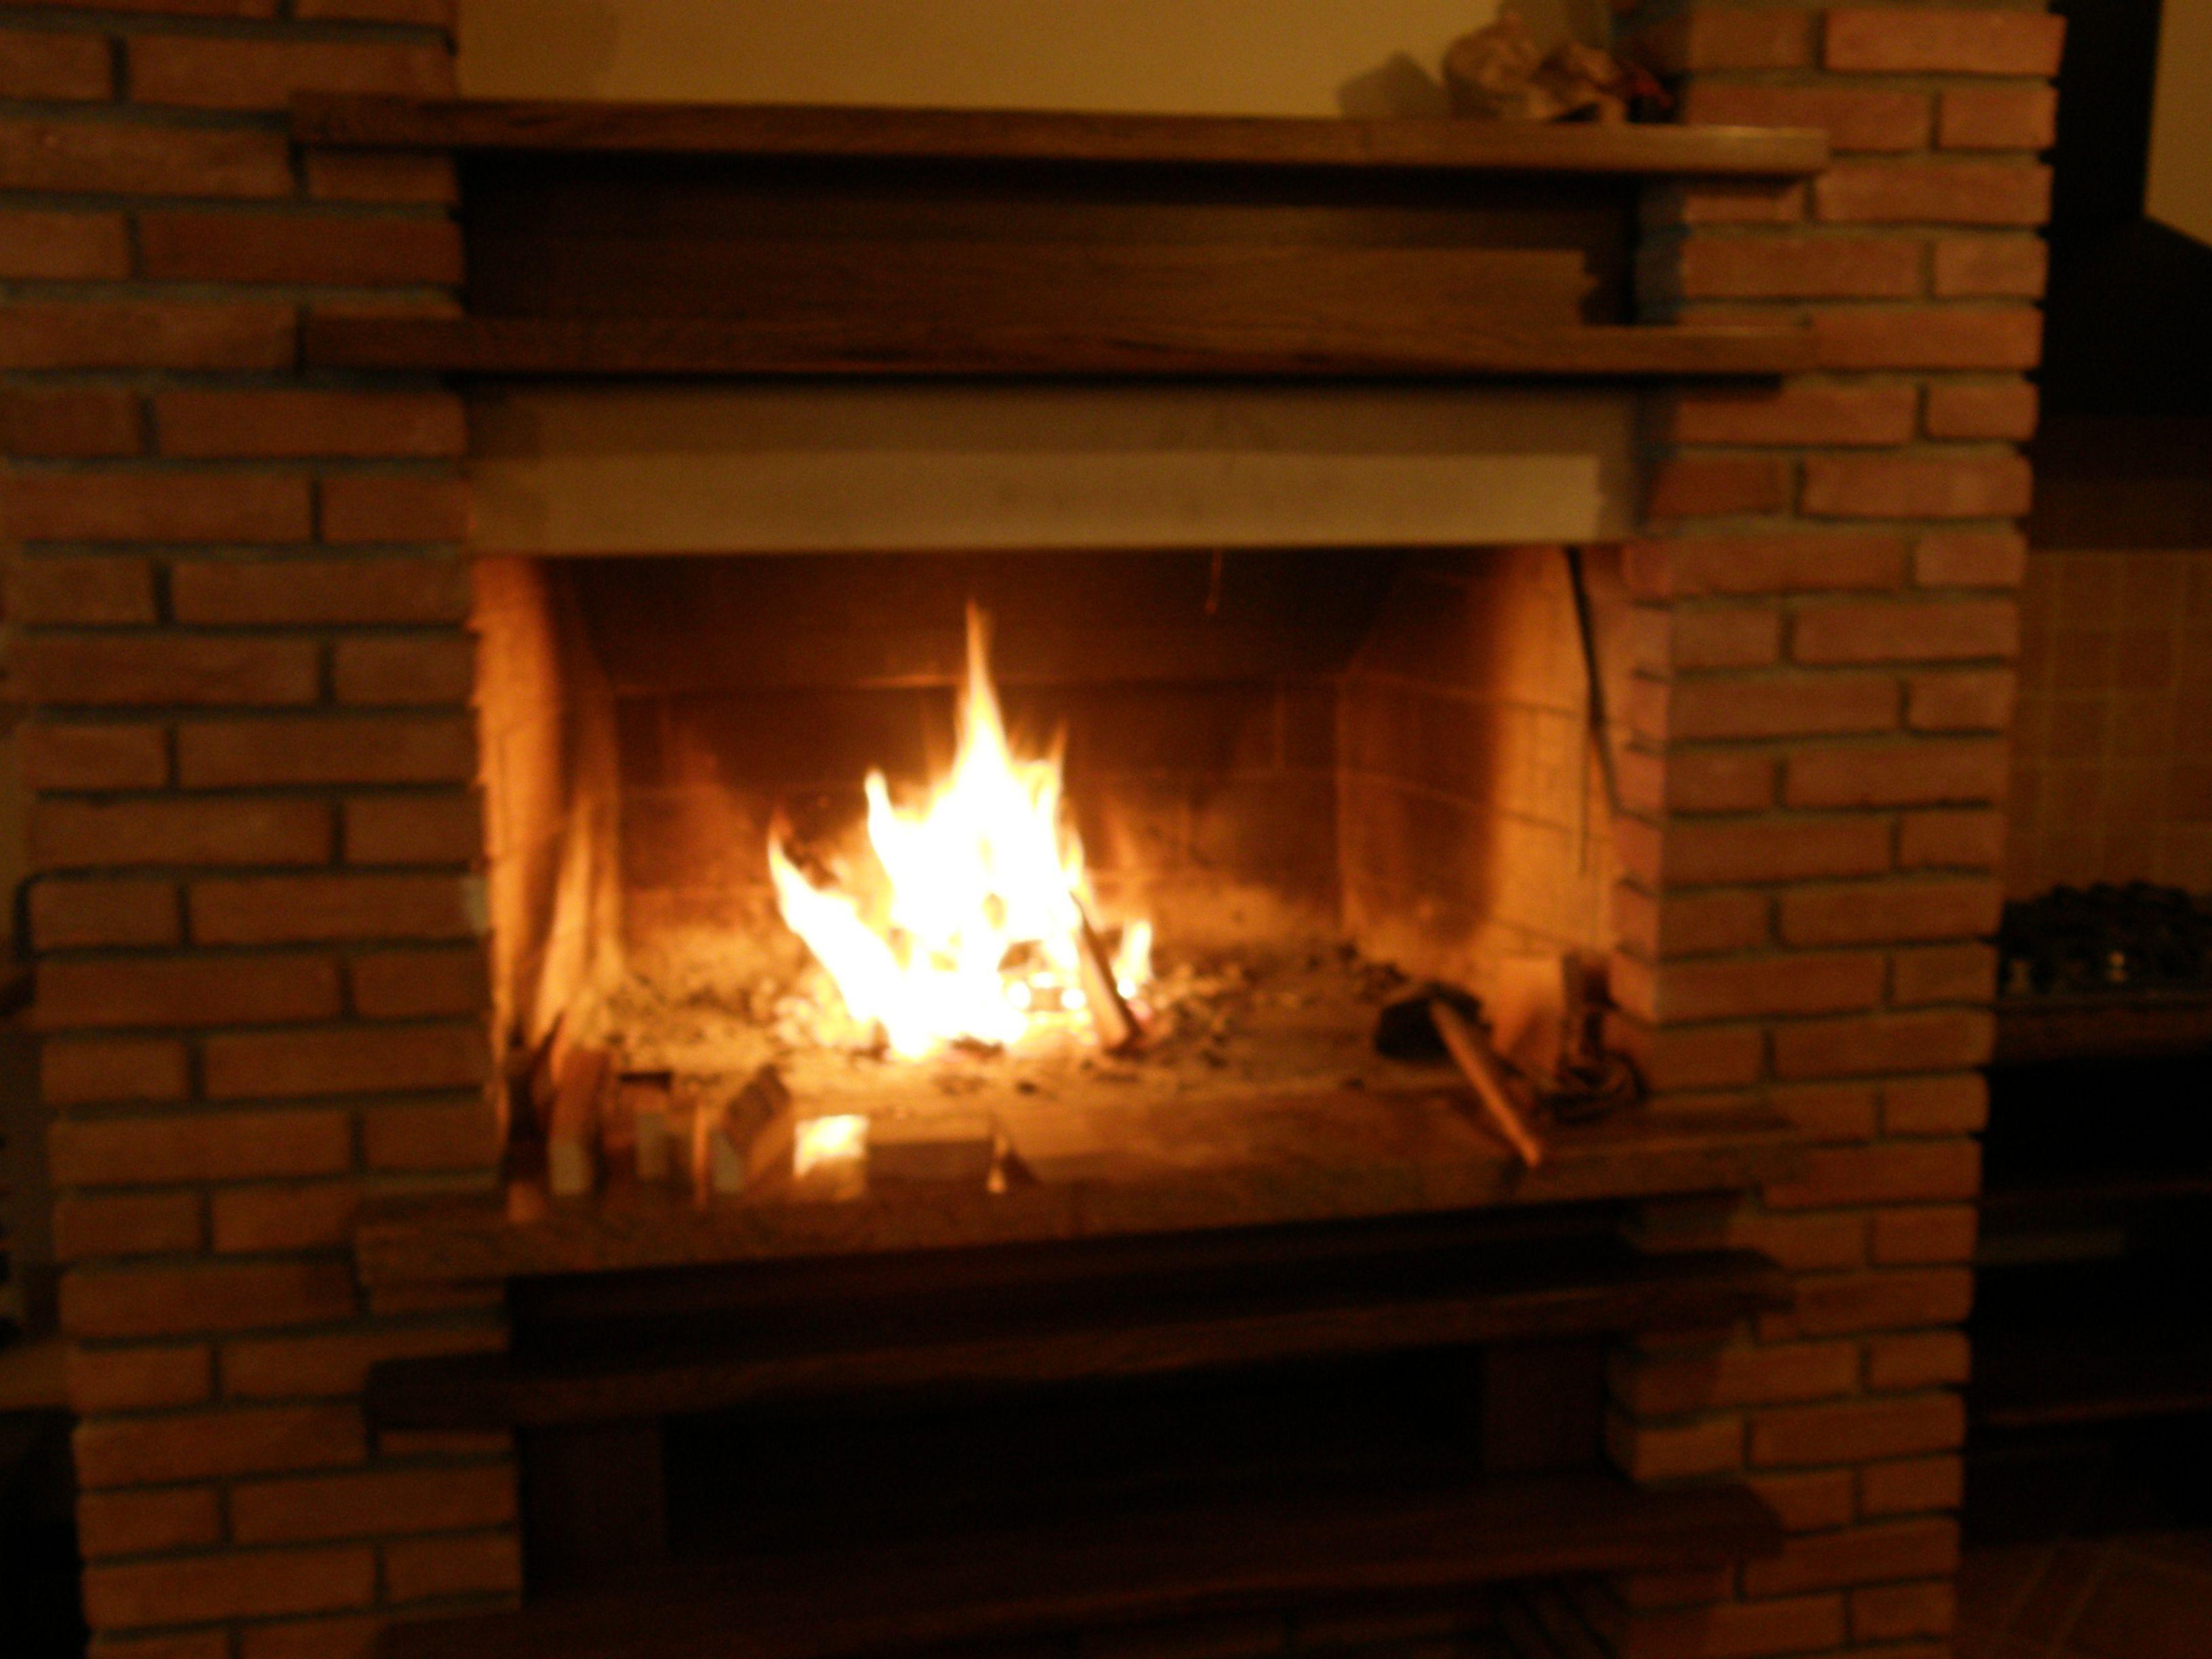 bricks and oak wood Oak wood, Wood, Brick